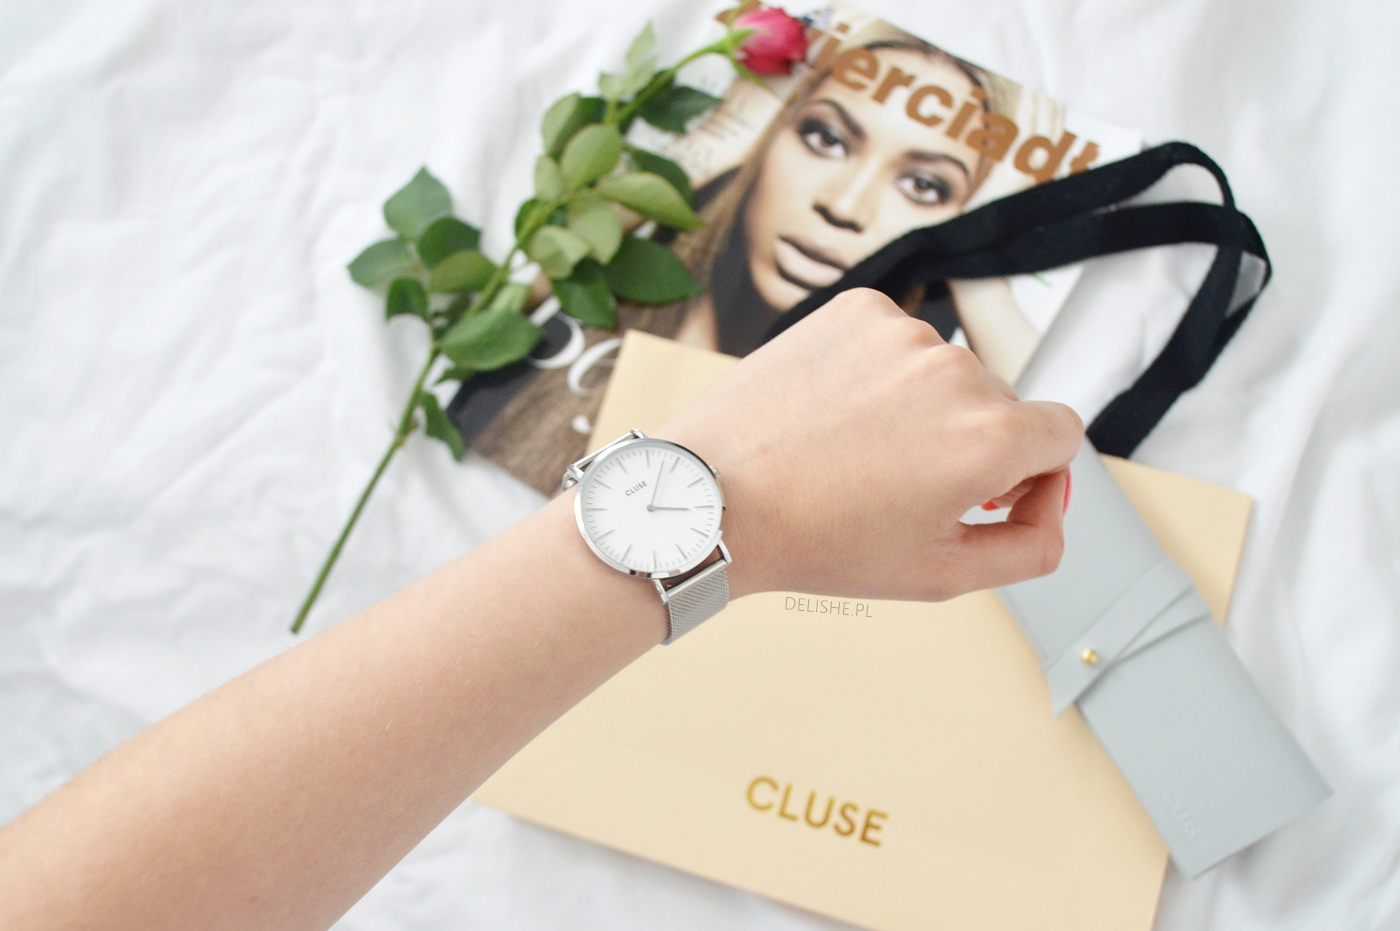 zegarek cluse blog